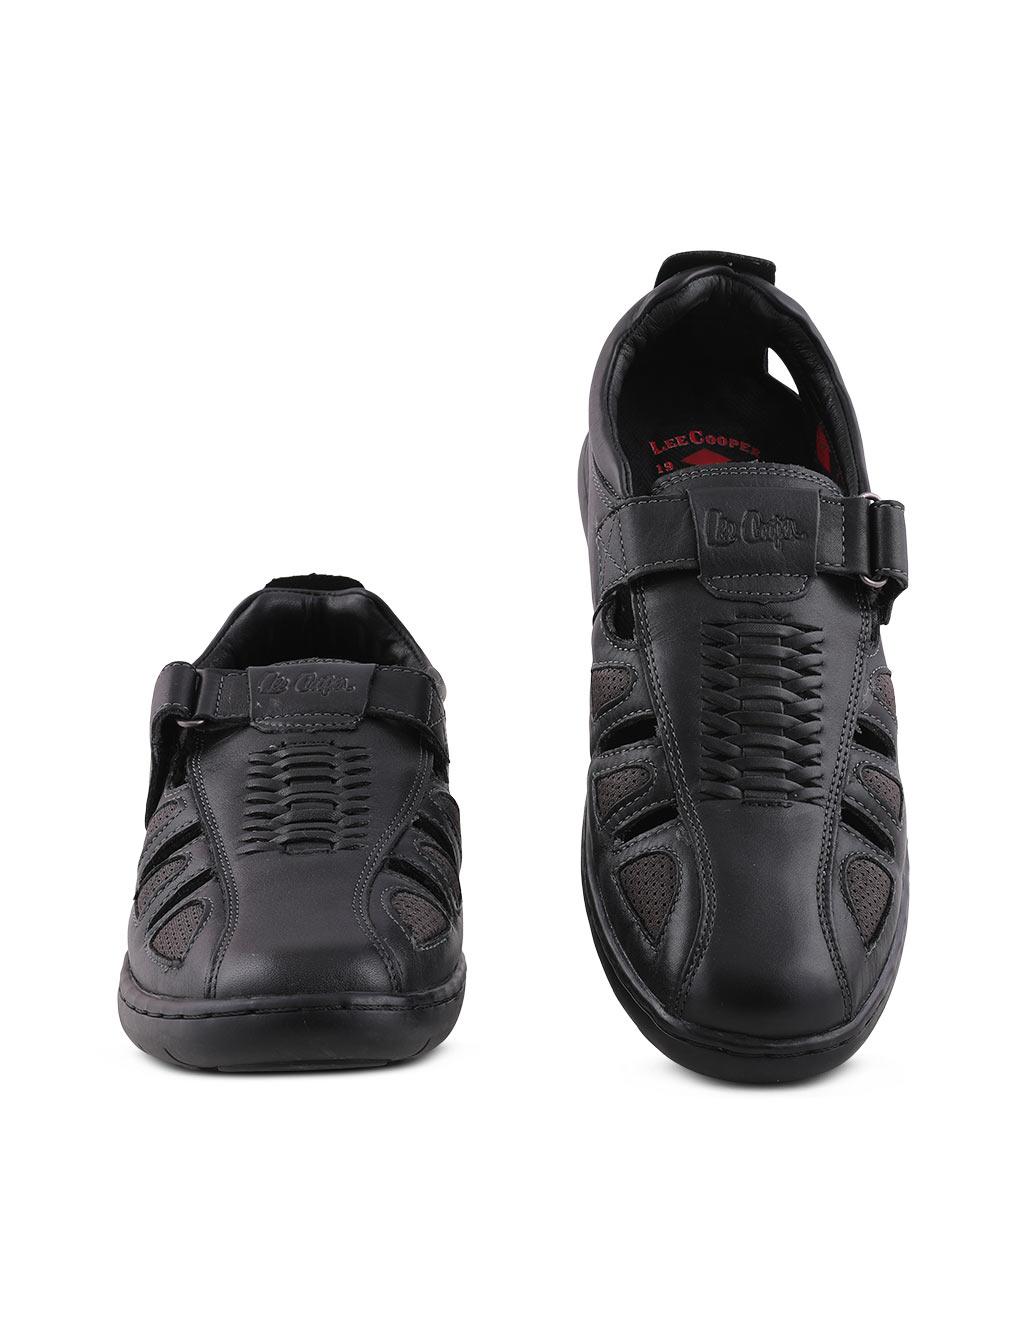 6b19d890ba89a Lee Cooper Men s Black Sandals - Buy Online at Best Prices